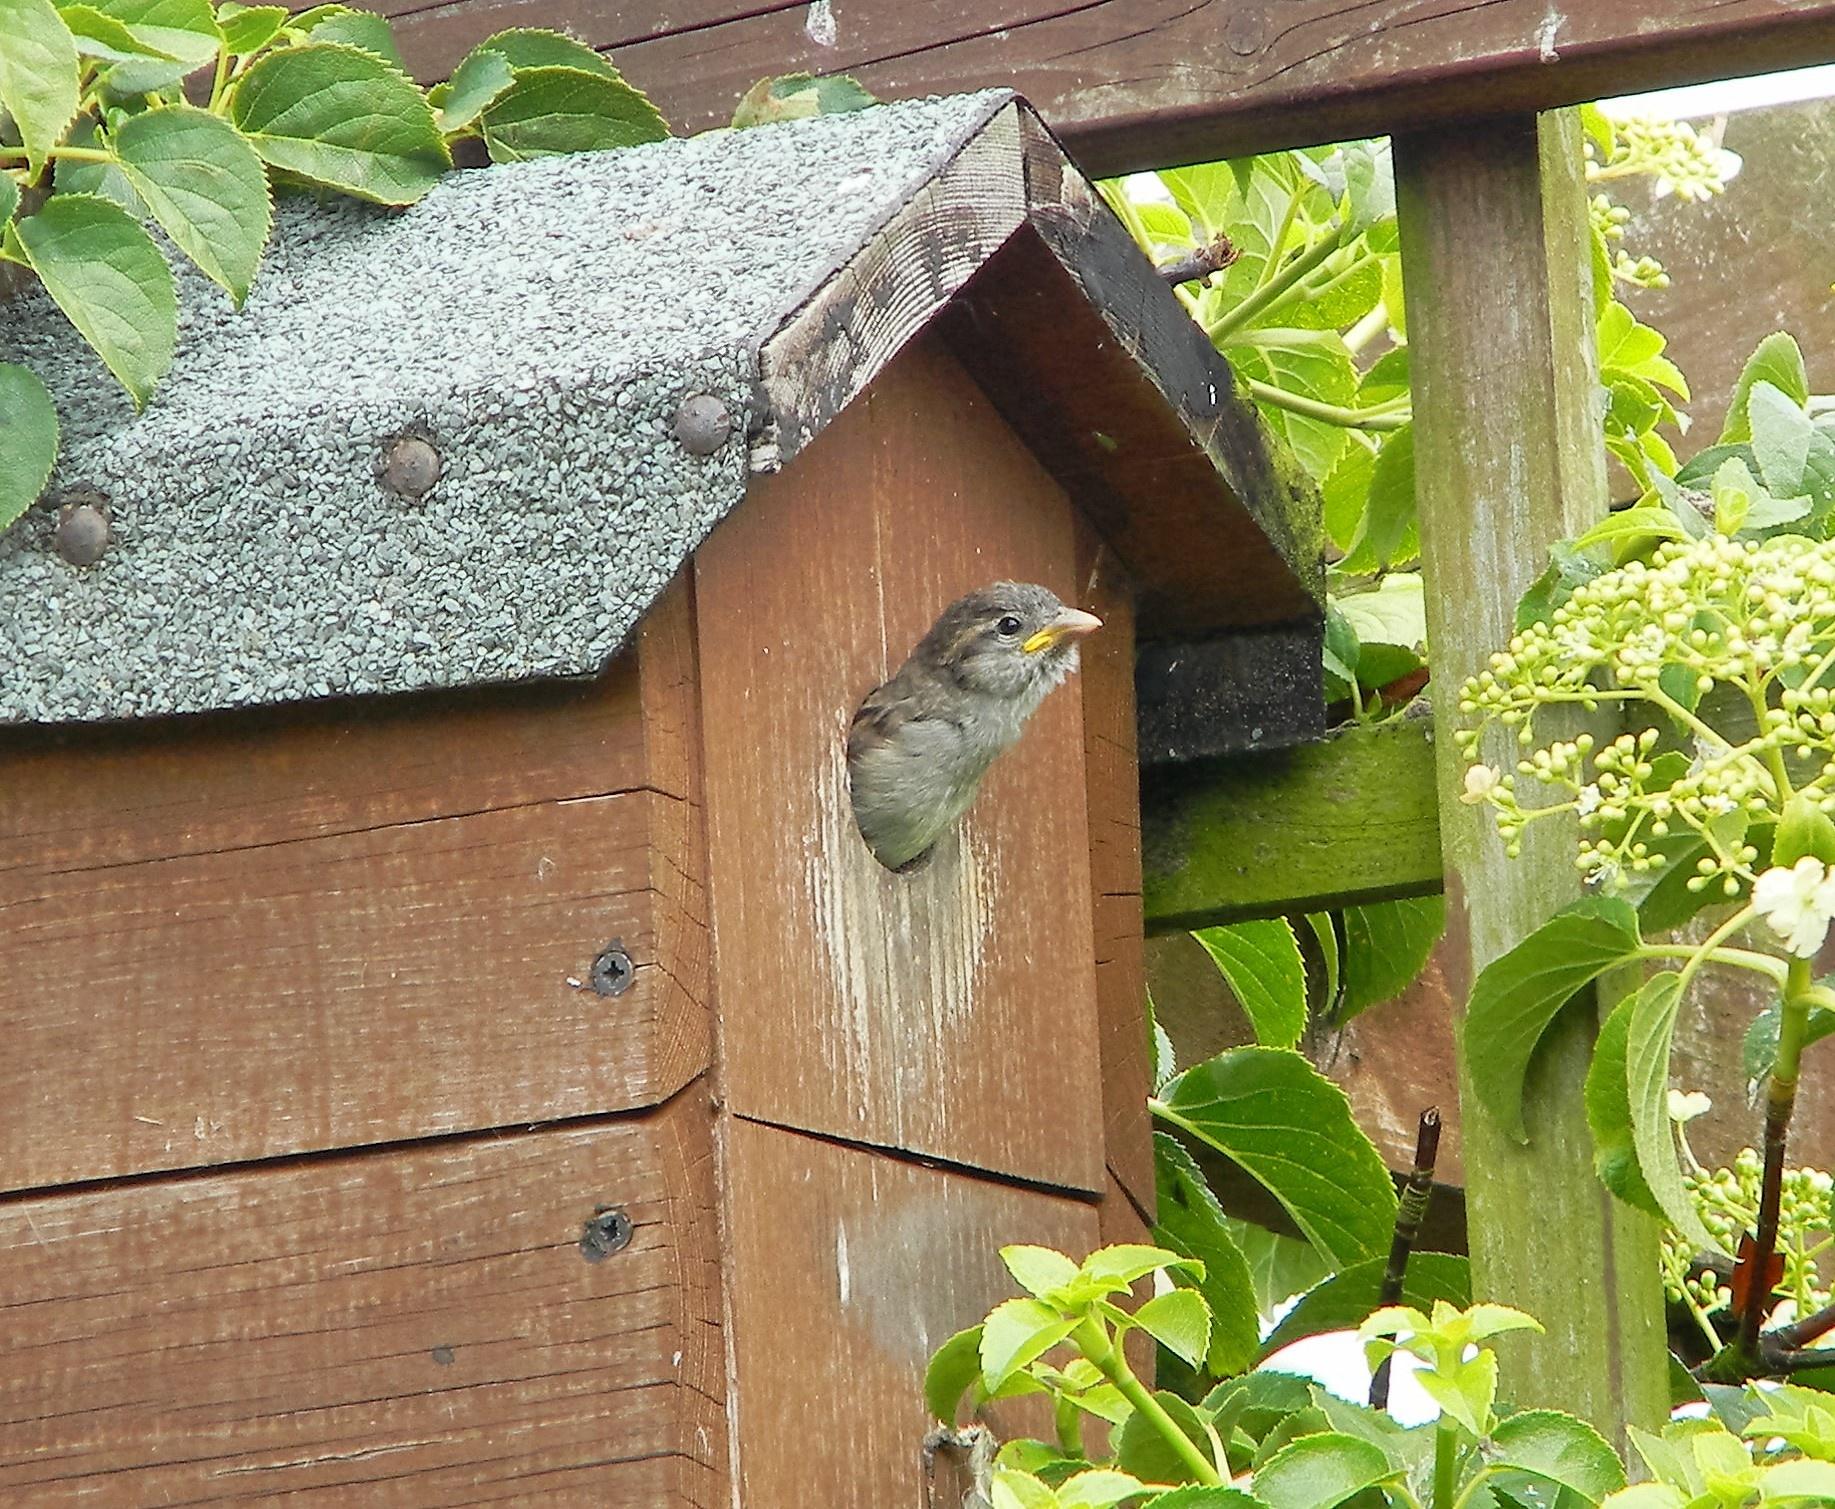 Baby Sparrow by Geraldine Cave